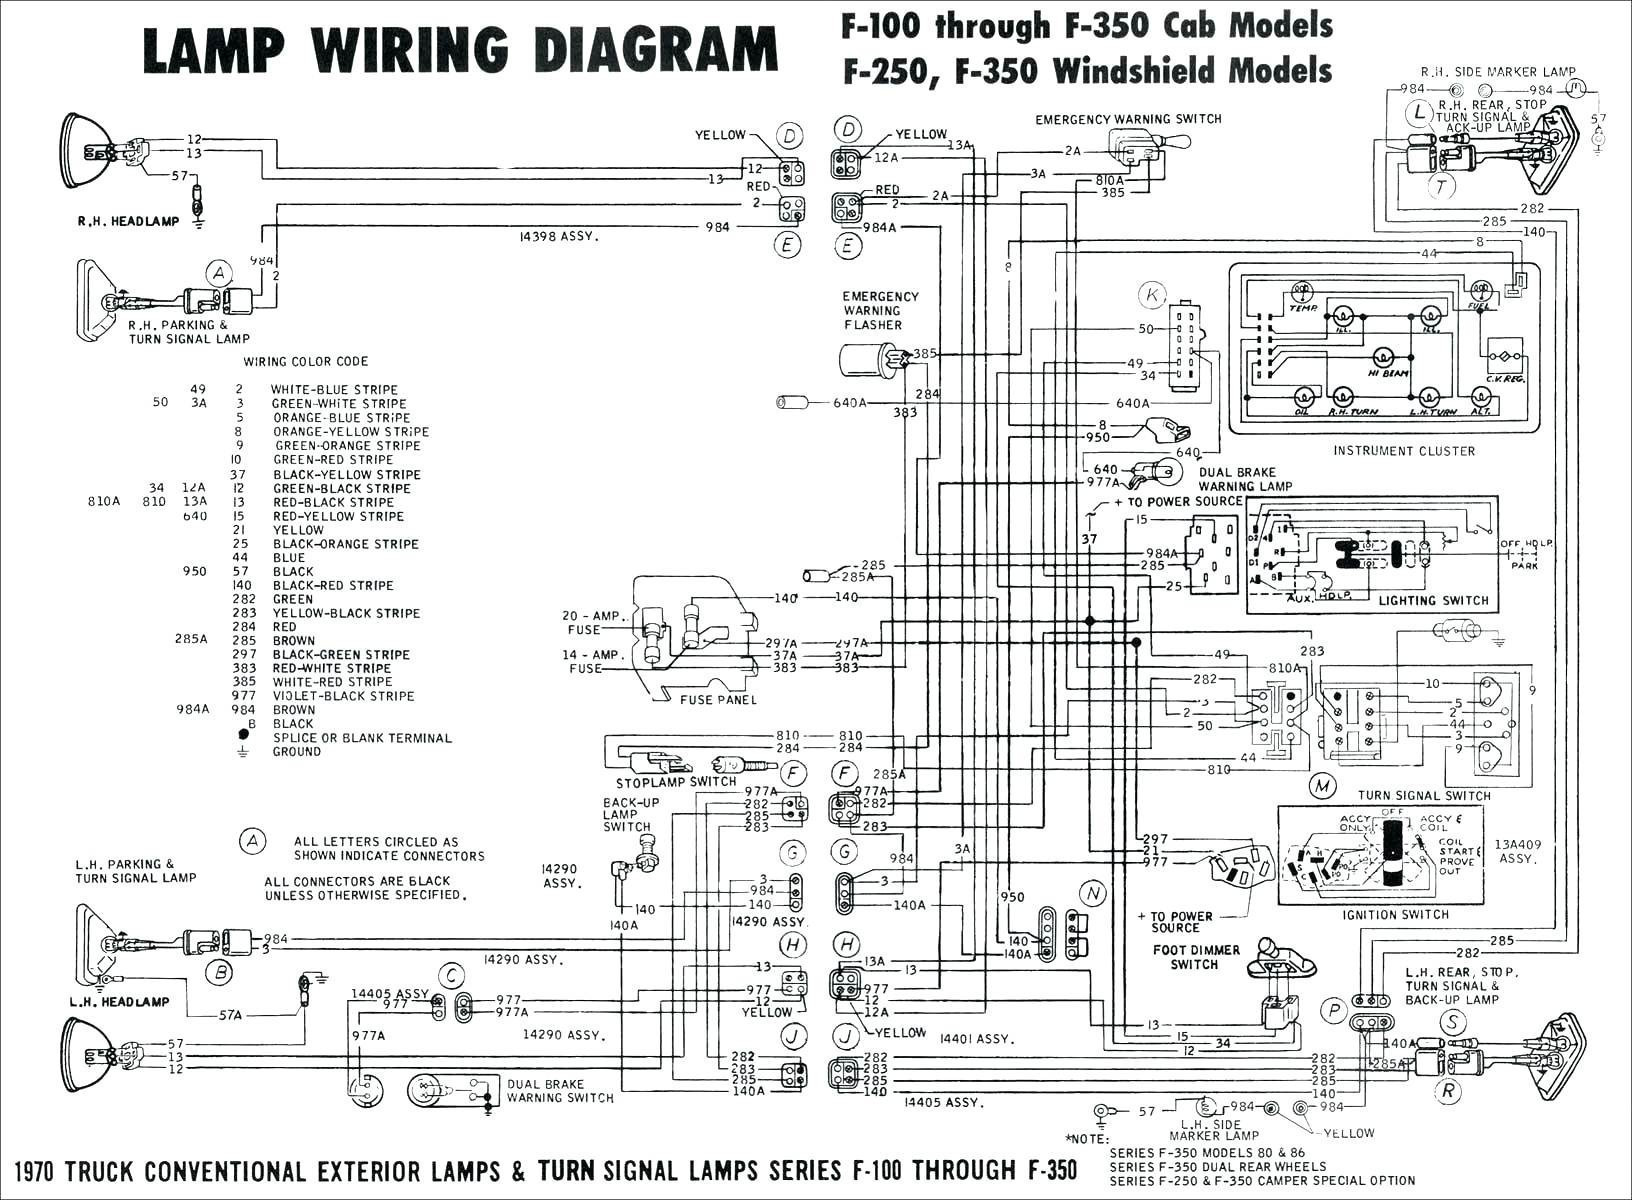 HF_6585] Viking 24 Volt Trailer Wiring SchematicHapolo Semec Spon Otene Trofu Dogan Unec Hylec Sequ Piot Rect  Mohammedshrine Librar Wiring 101